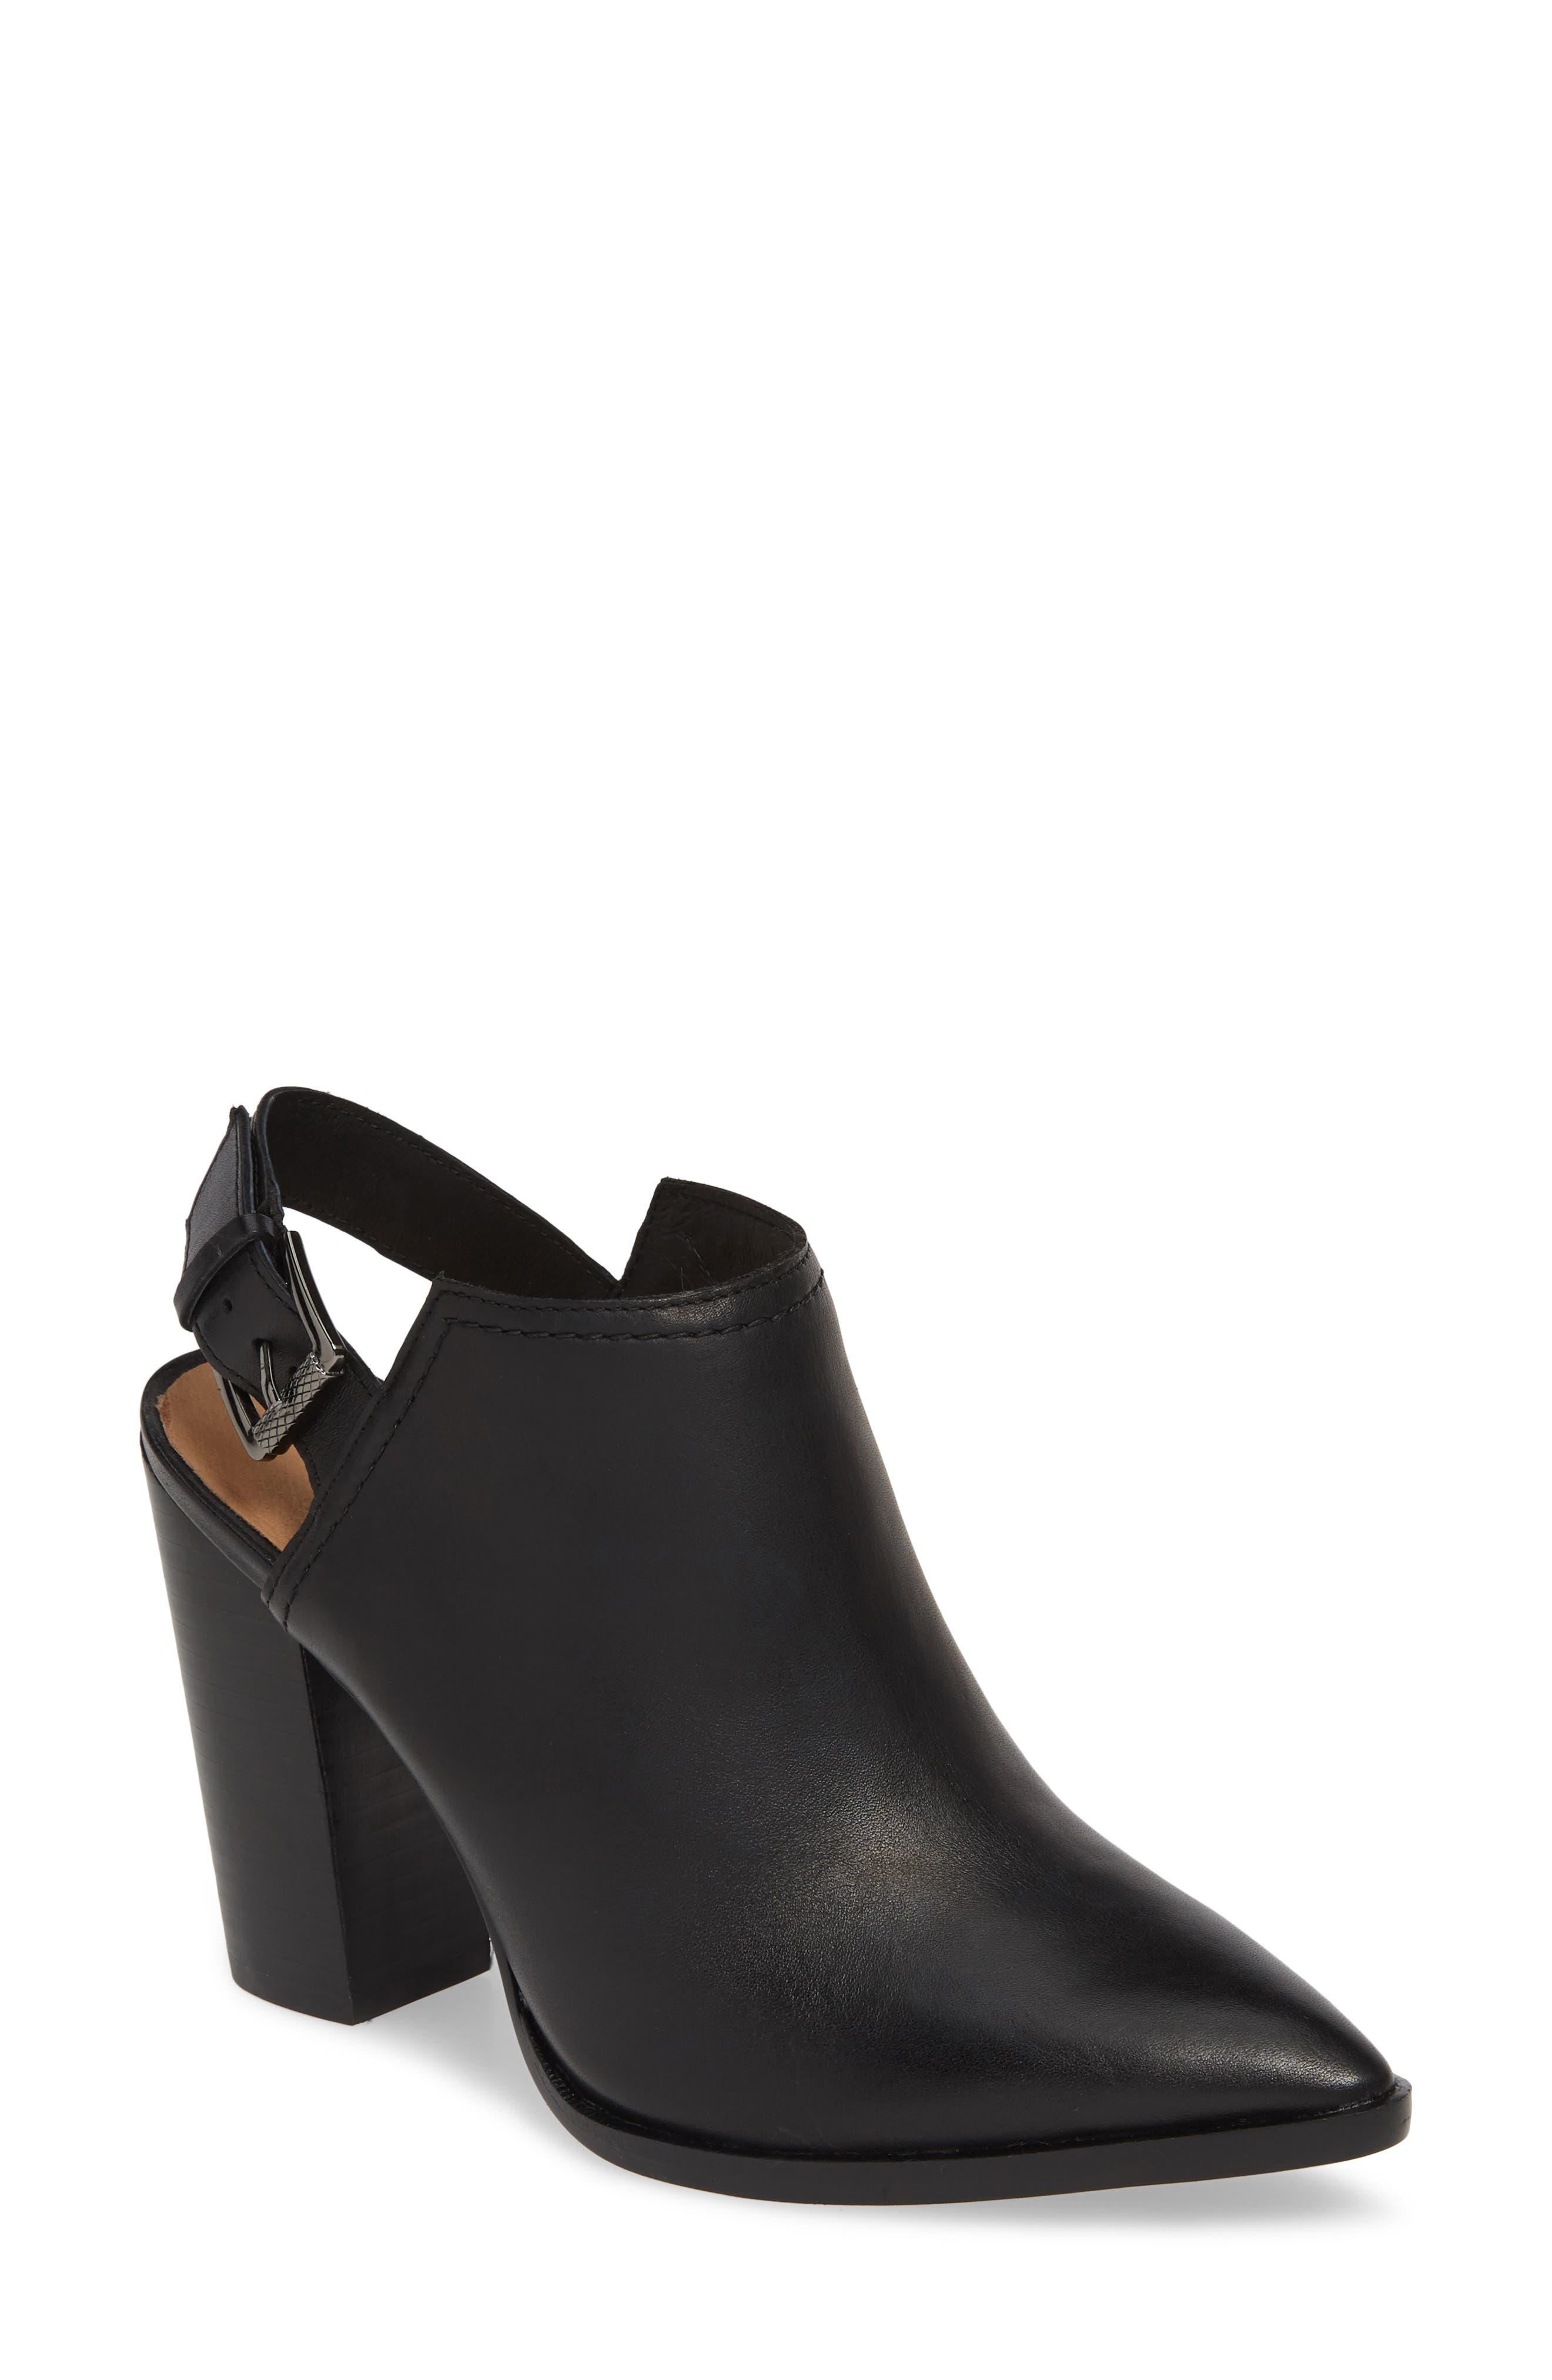 HALOGEN<SUP>®</SUP> Brooke Stacked Heel Bootie, Main, color, BLACK LEATHER